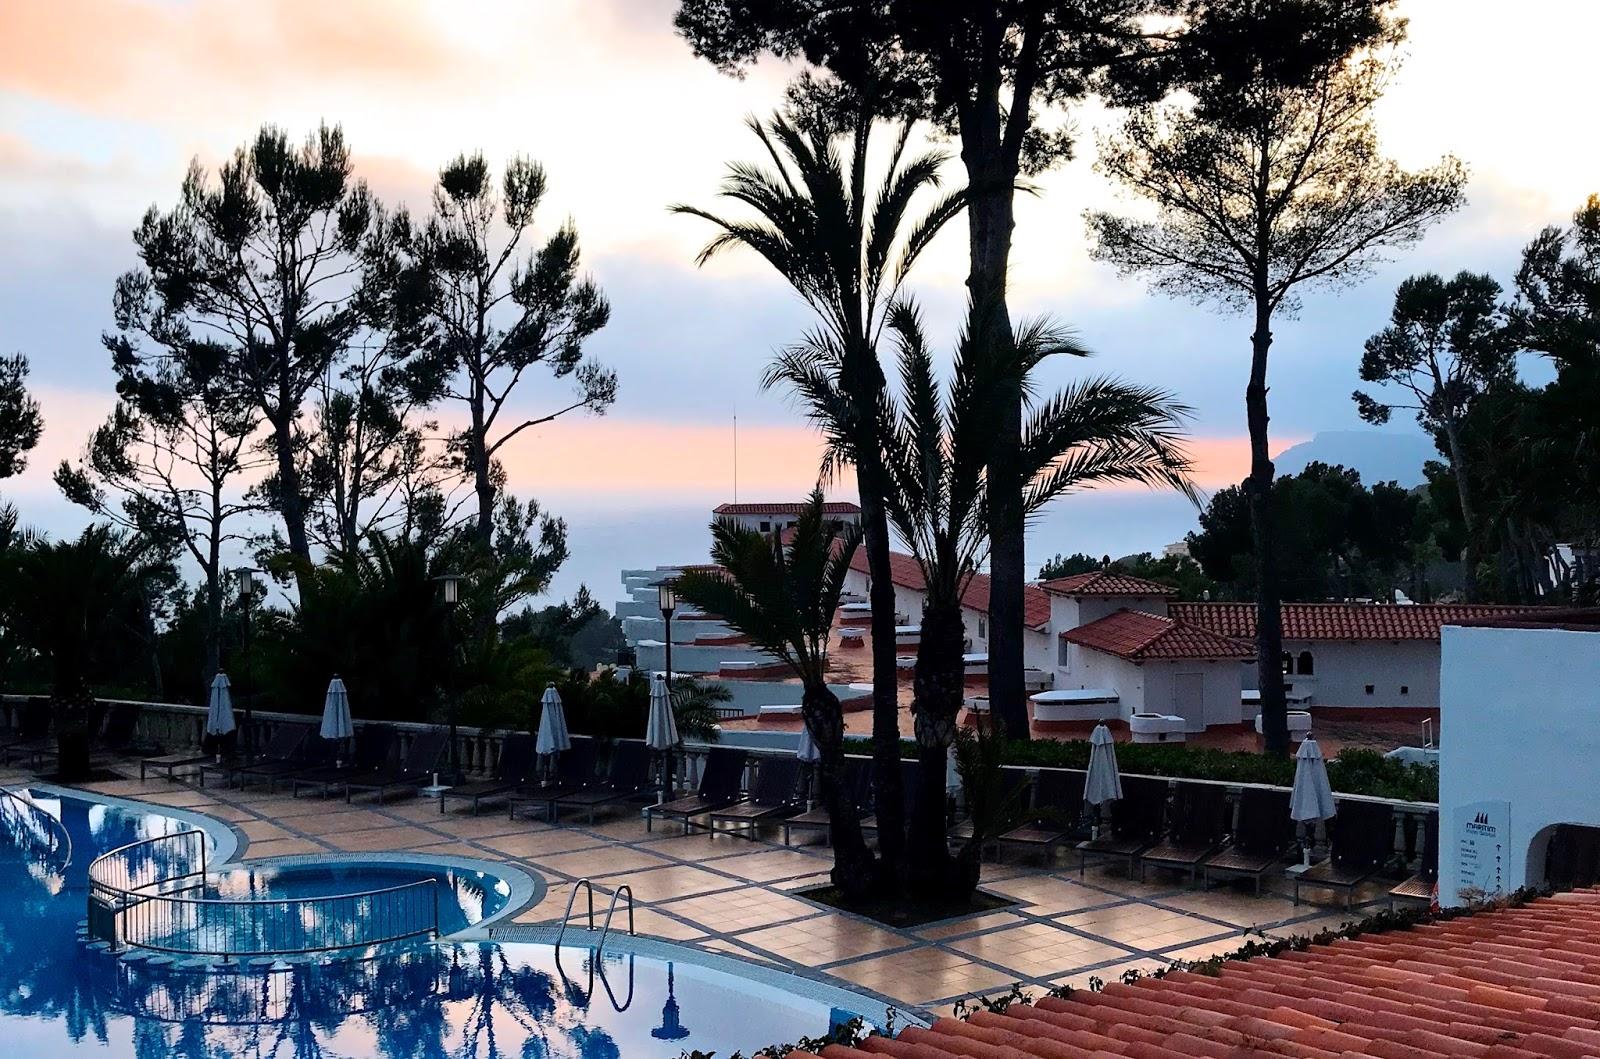 Mallorca at Dusk